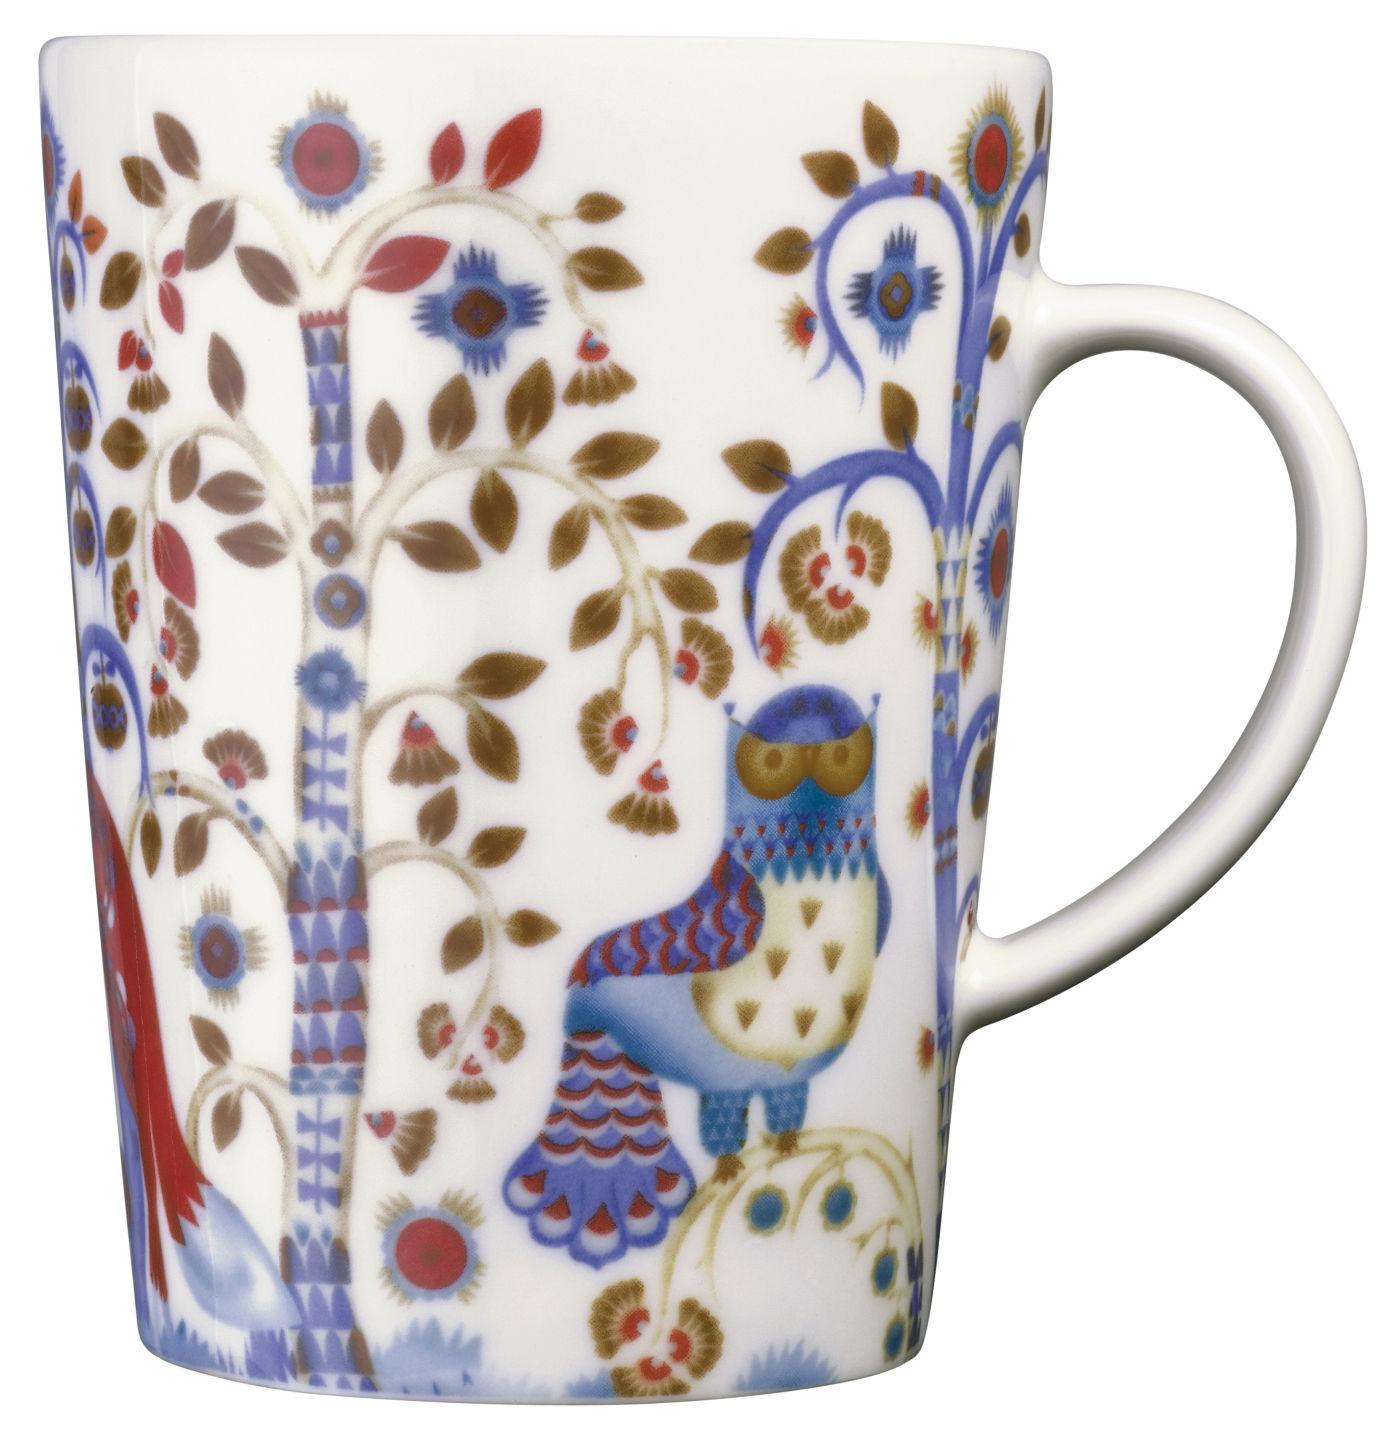 Tableware - Coffee Mugs & Tea Cups - Taika Mug by Iittala - White bottom - Ceramic